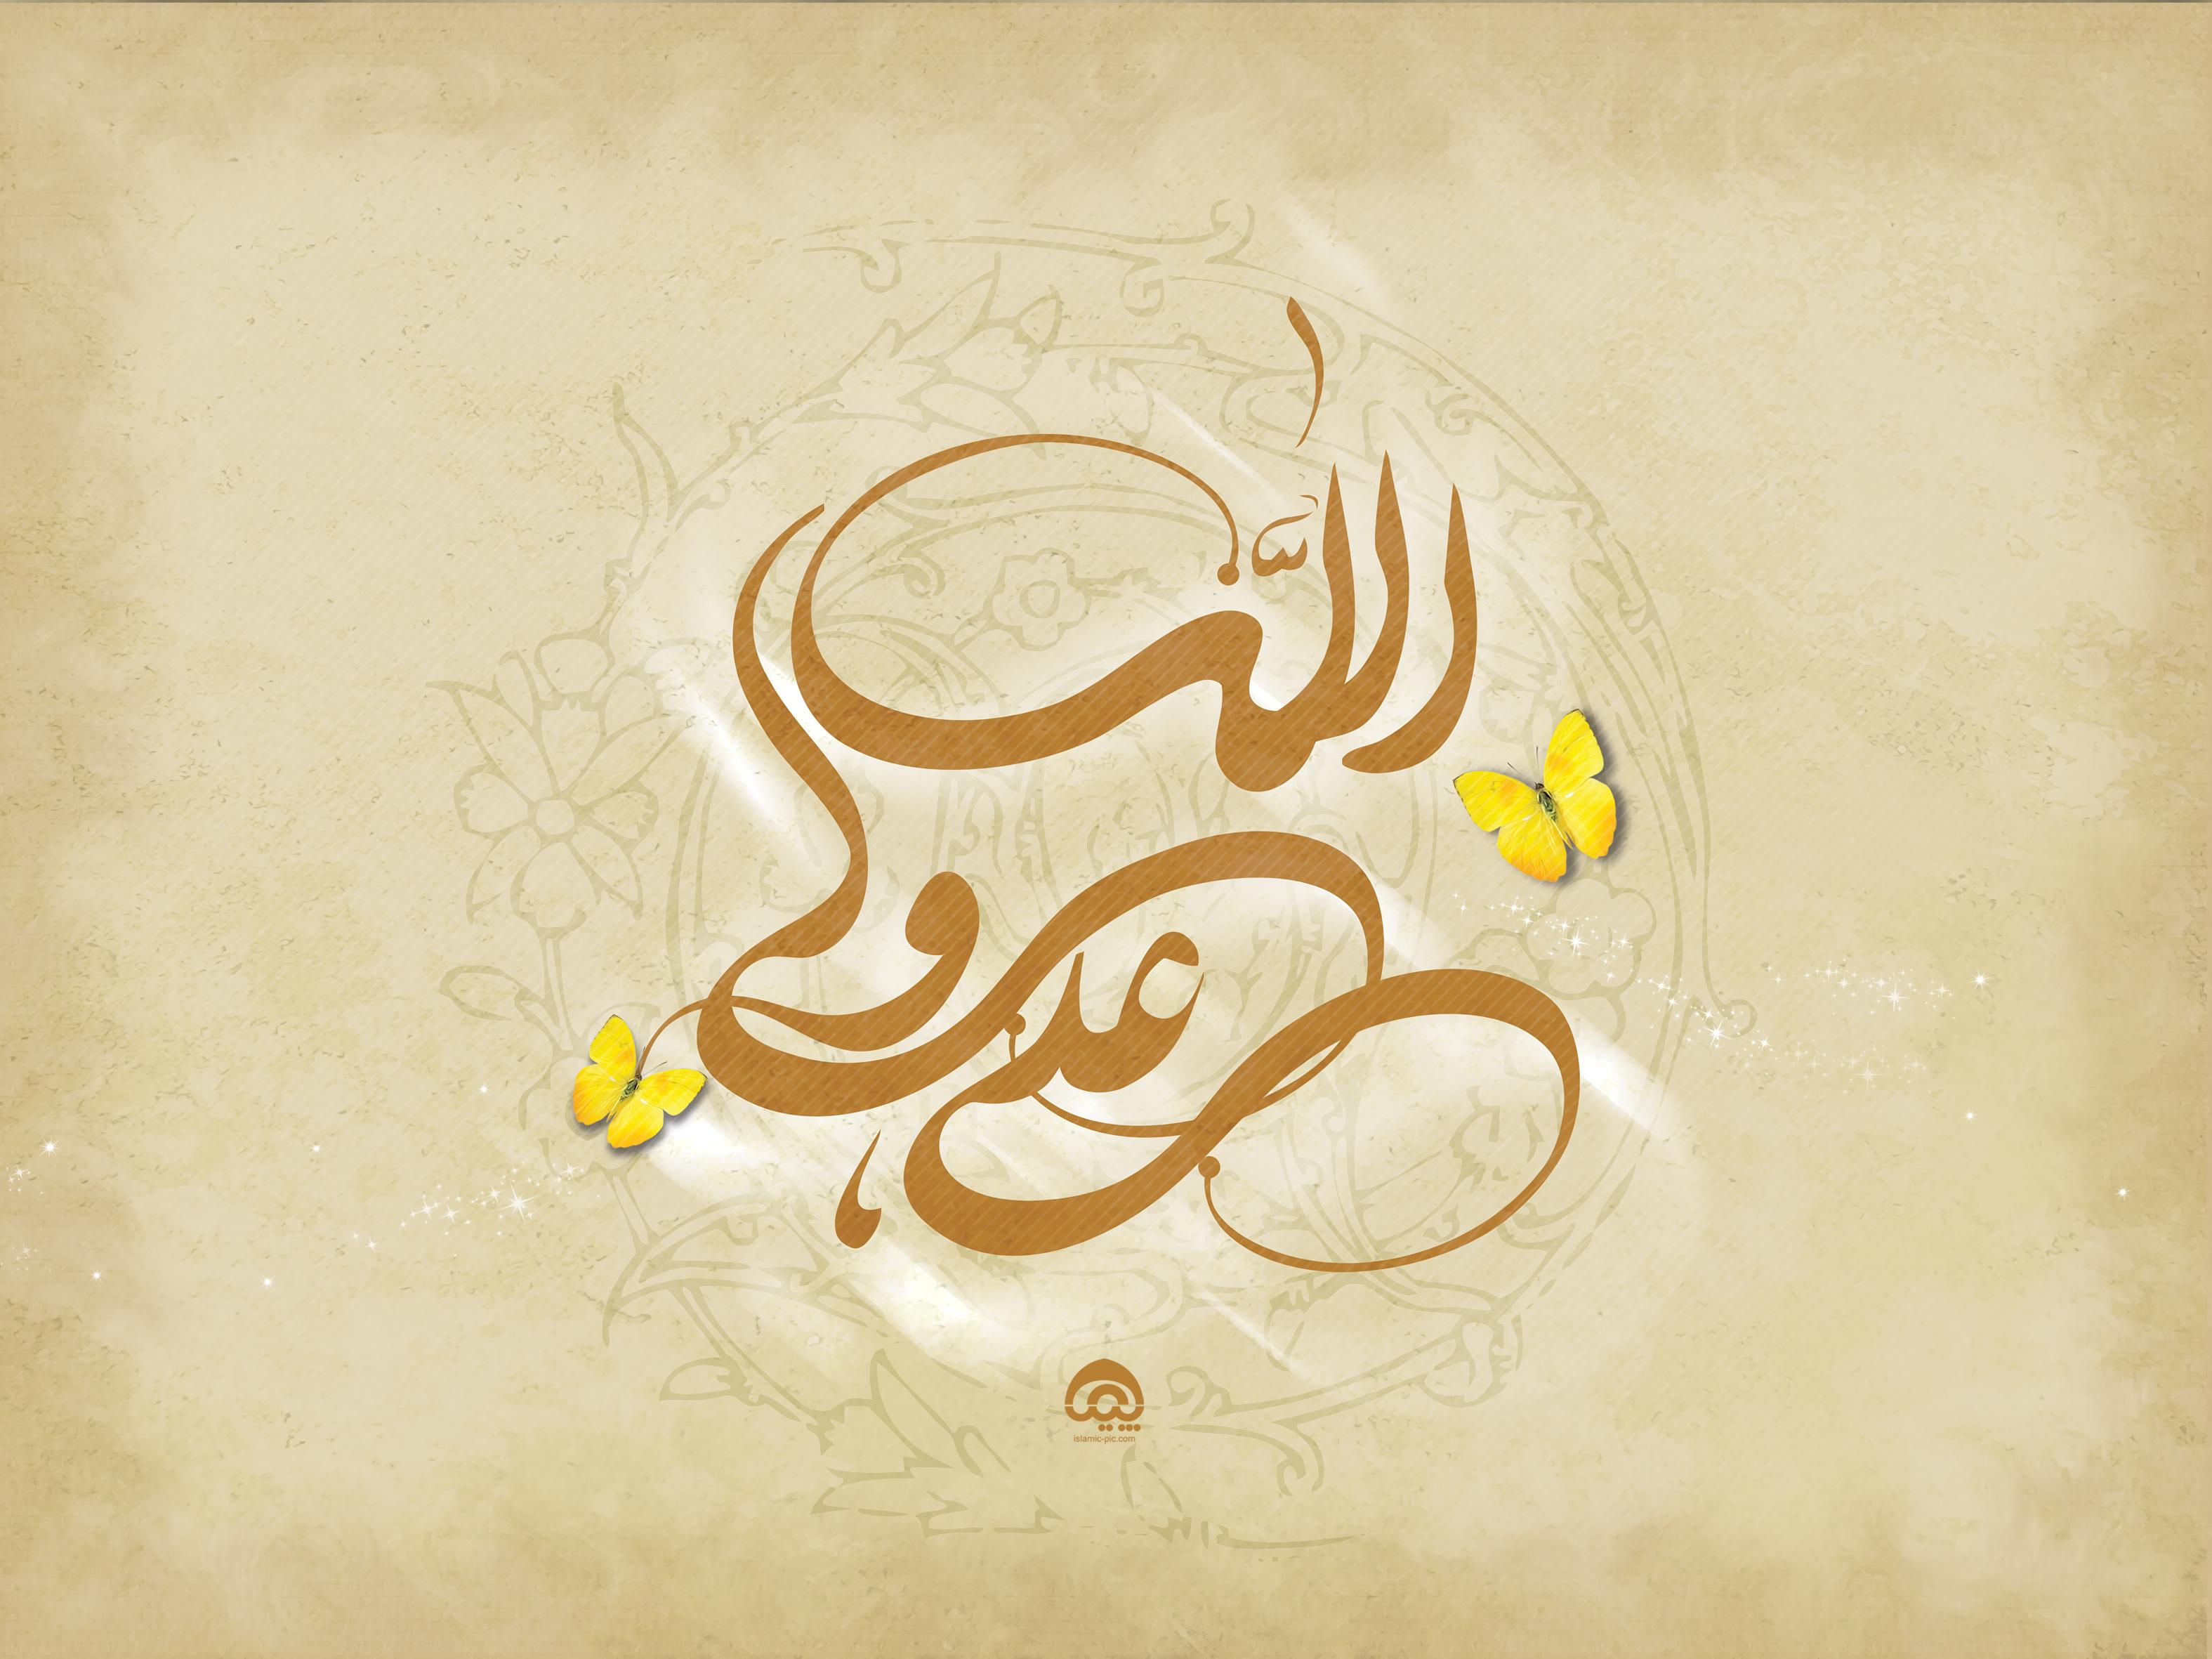 پوستر ولادت حضرت امام علی (علیه السلام)